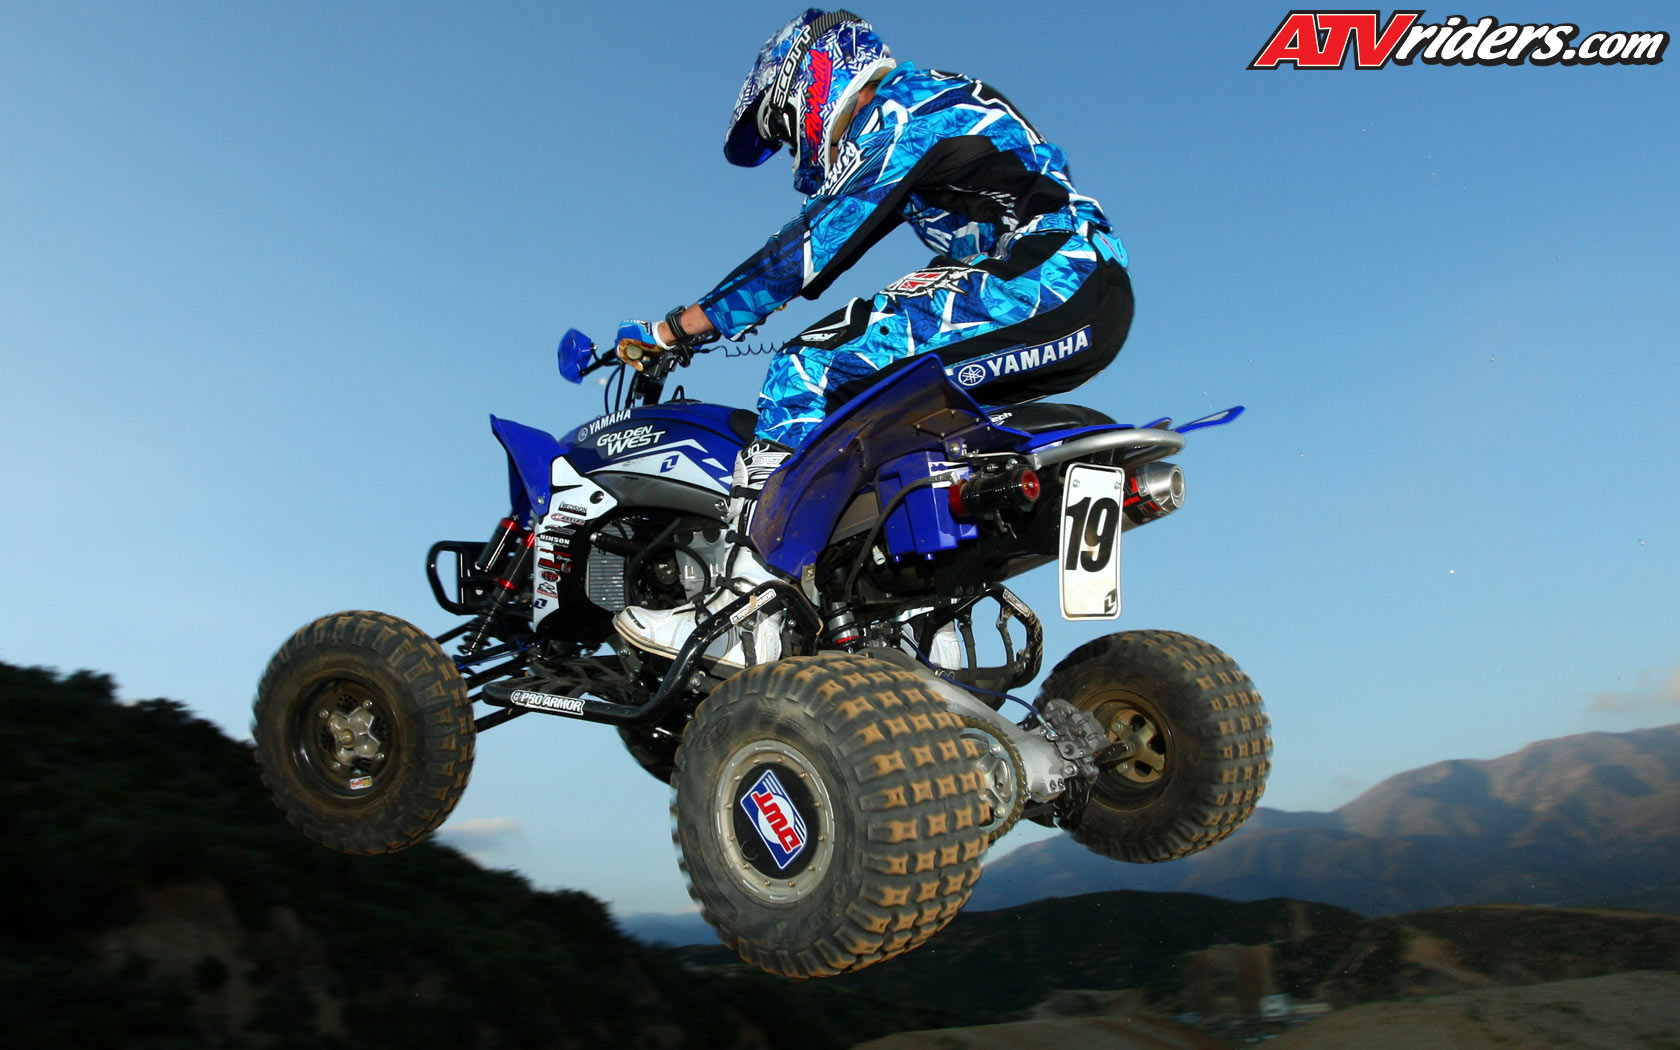 Yamaha YFZ450R ATV   Wednesday Wallpapers   Weekly ATV 1680x1050